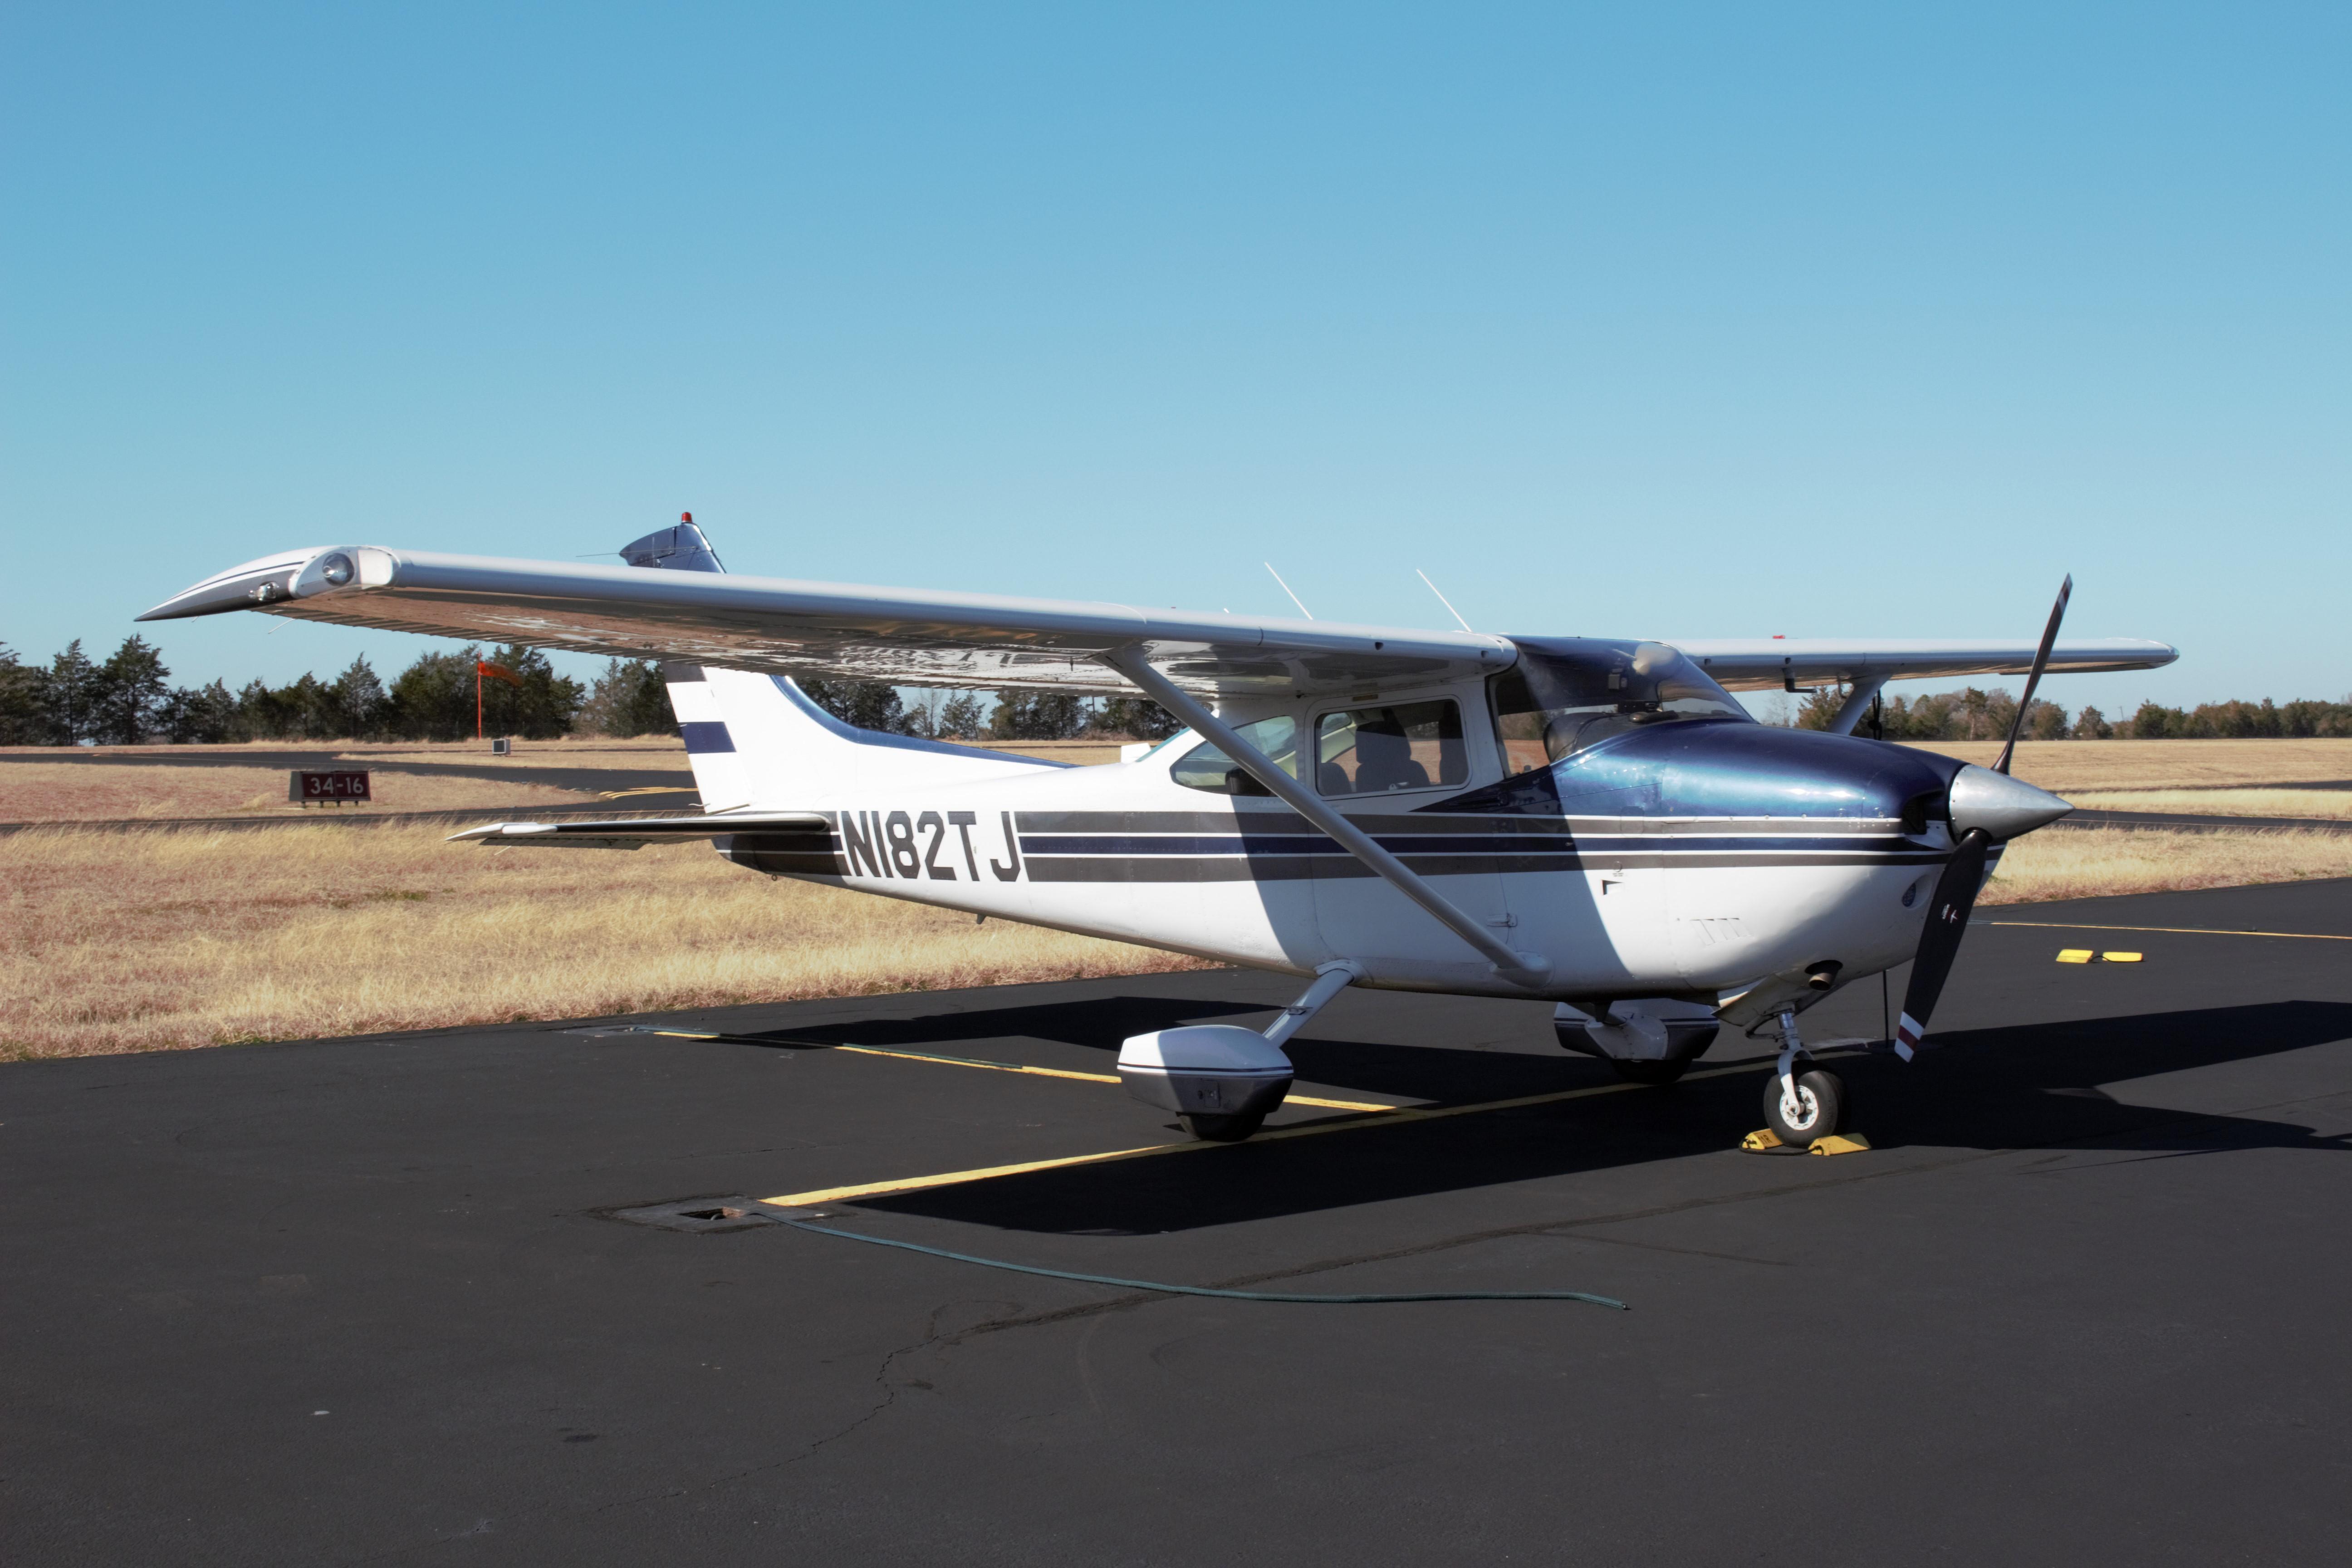 1977 Cessna 182q Skylane For Sale N182tj Planeboard